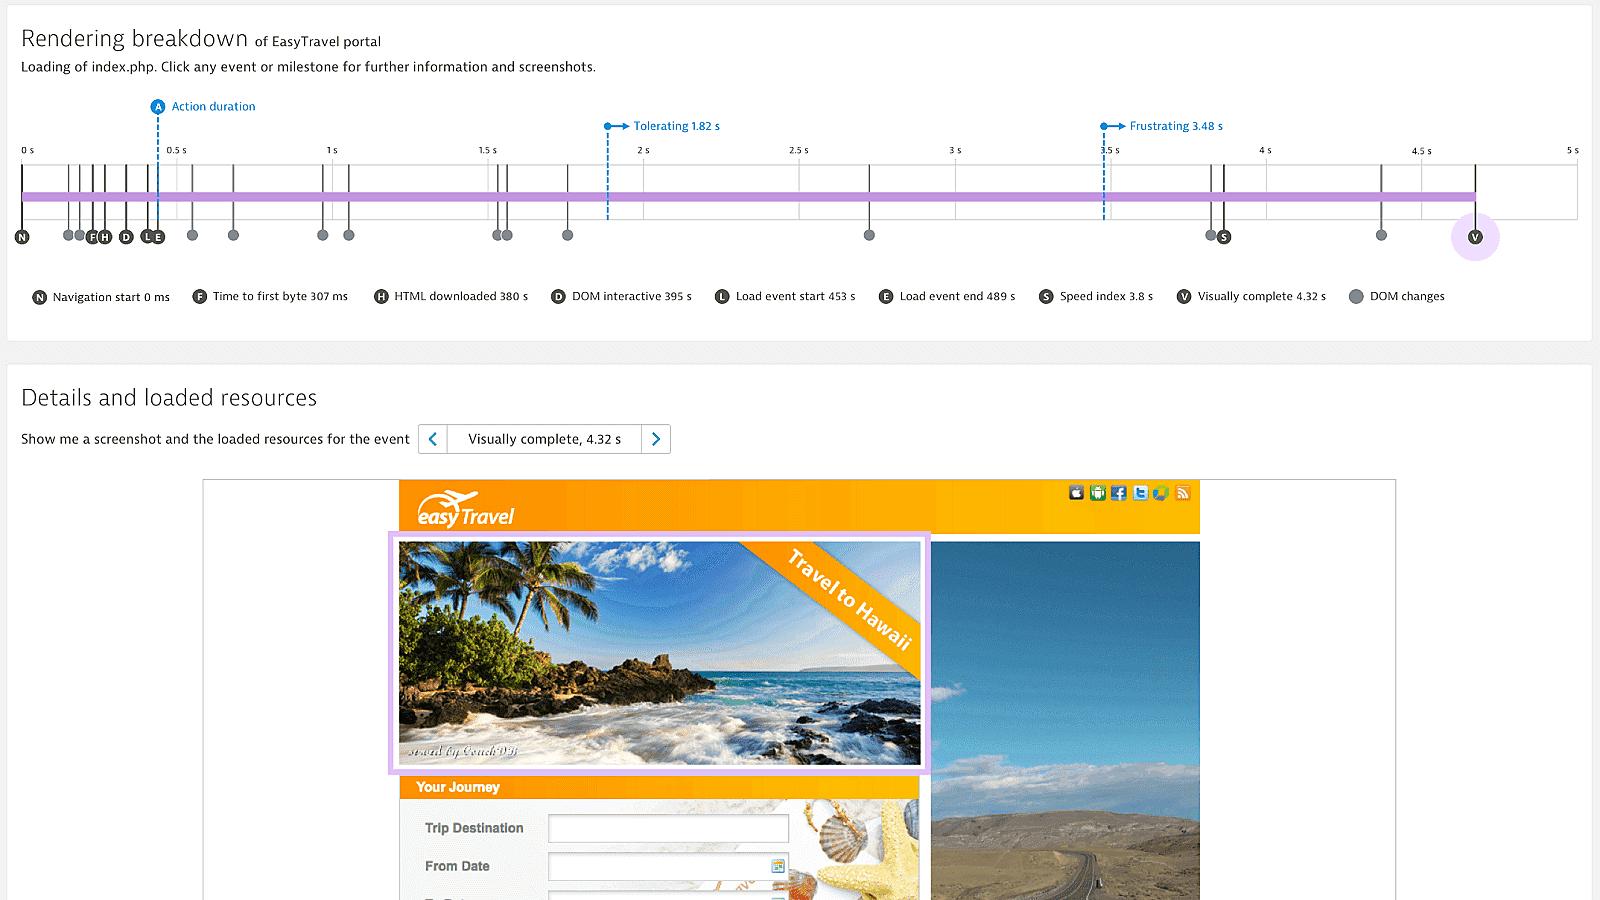 Dynatrace single page app visually complete